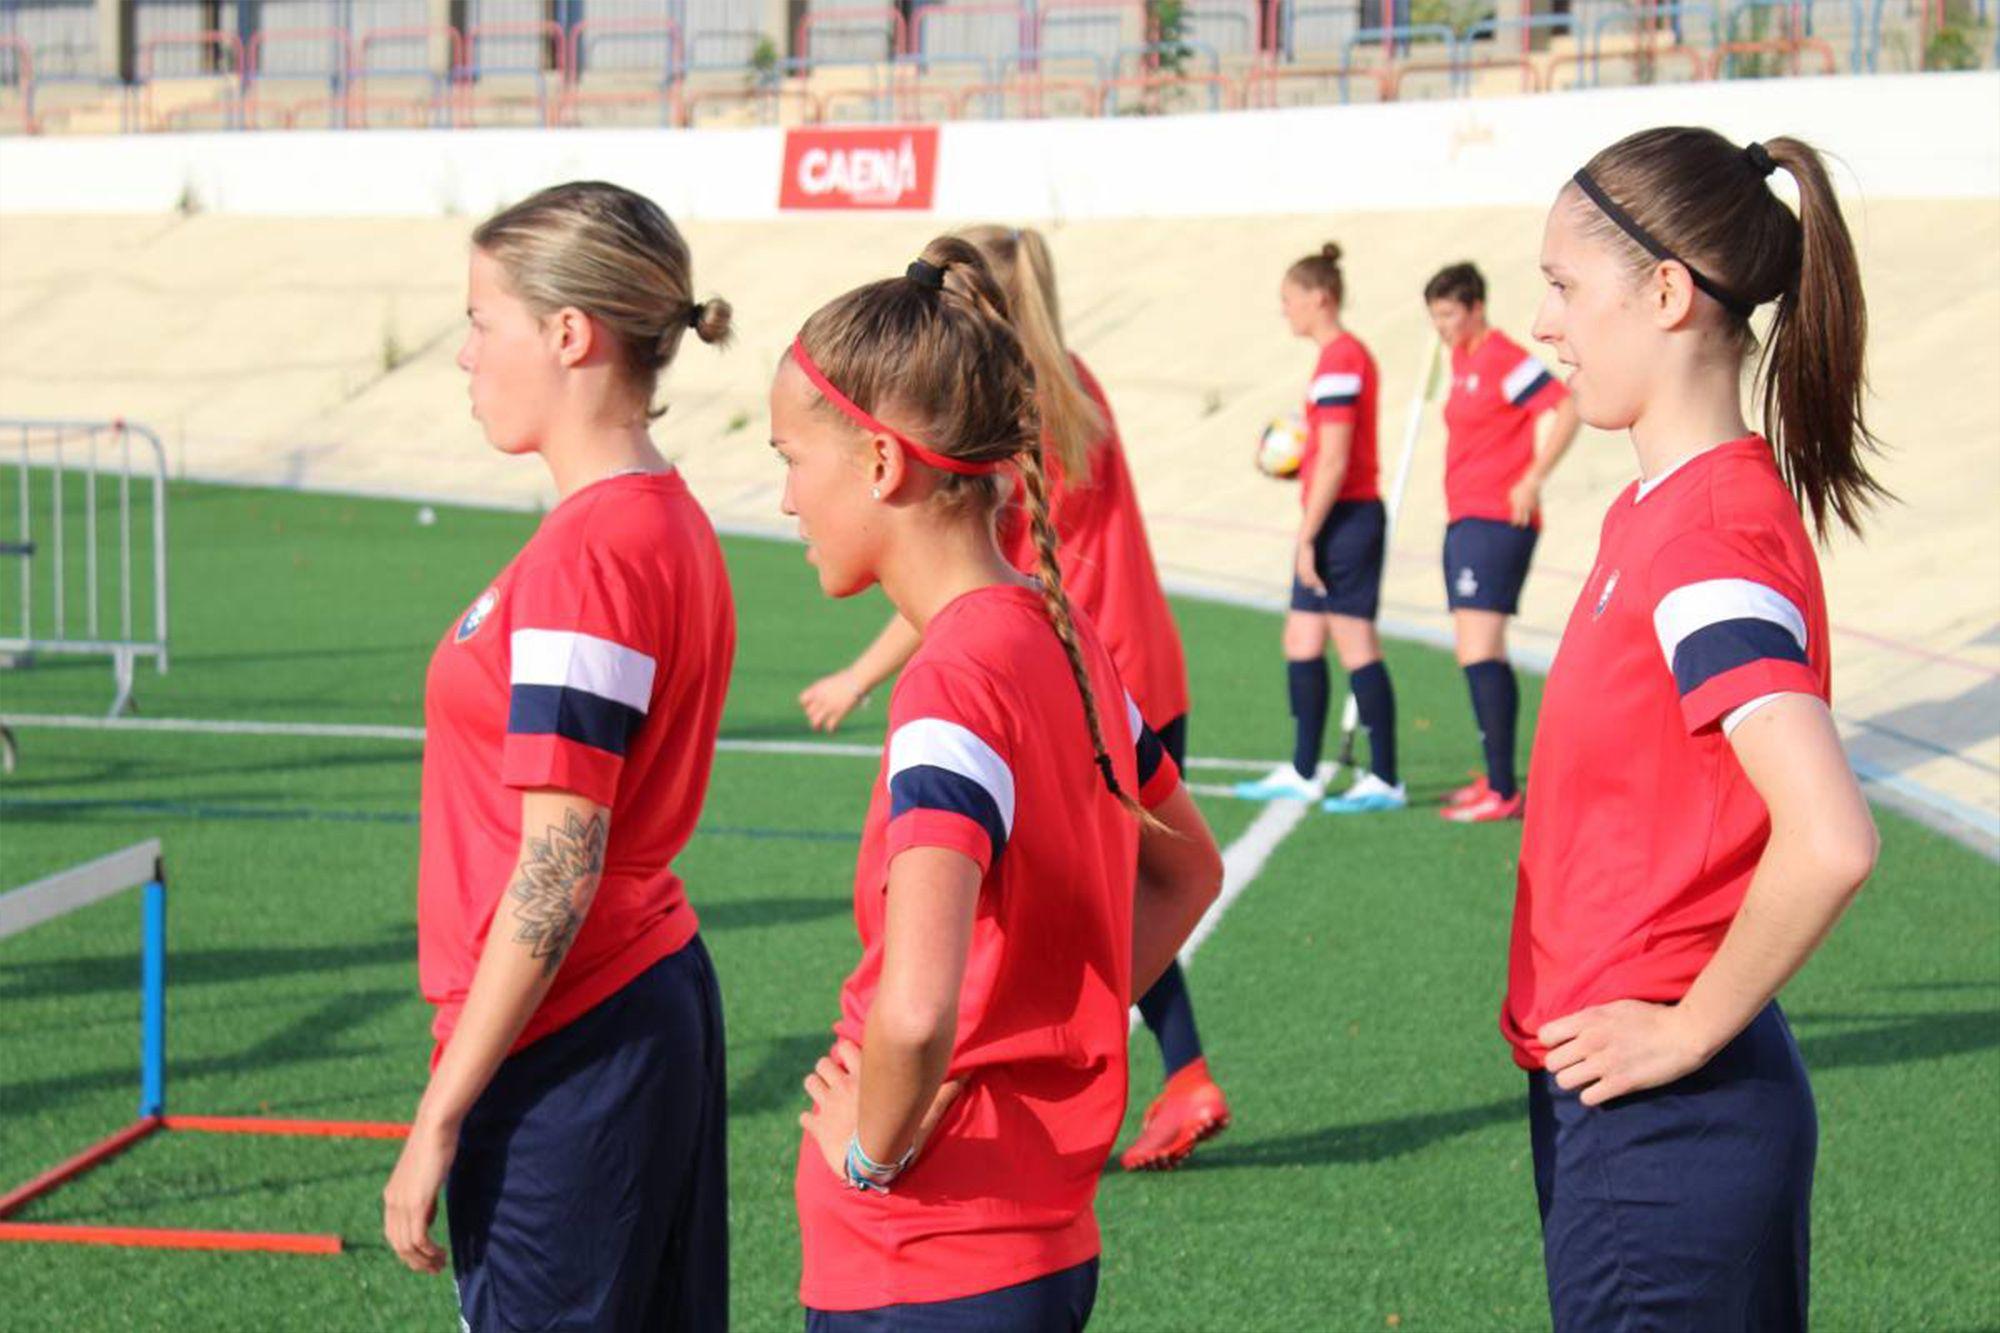 R1 Féminines : le Stade Malherbe débutera sa saison face au FC Rouen